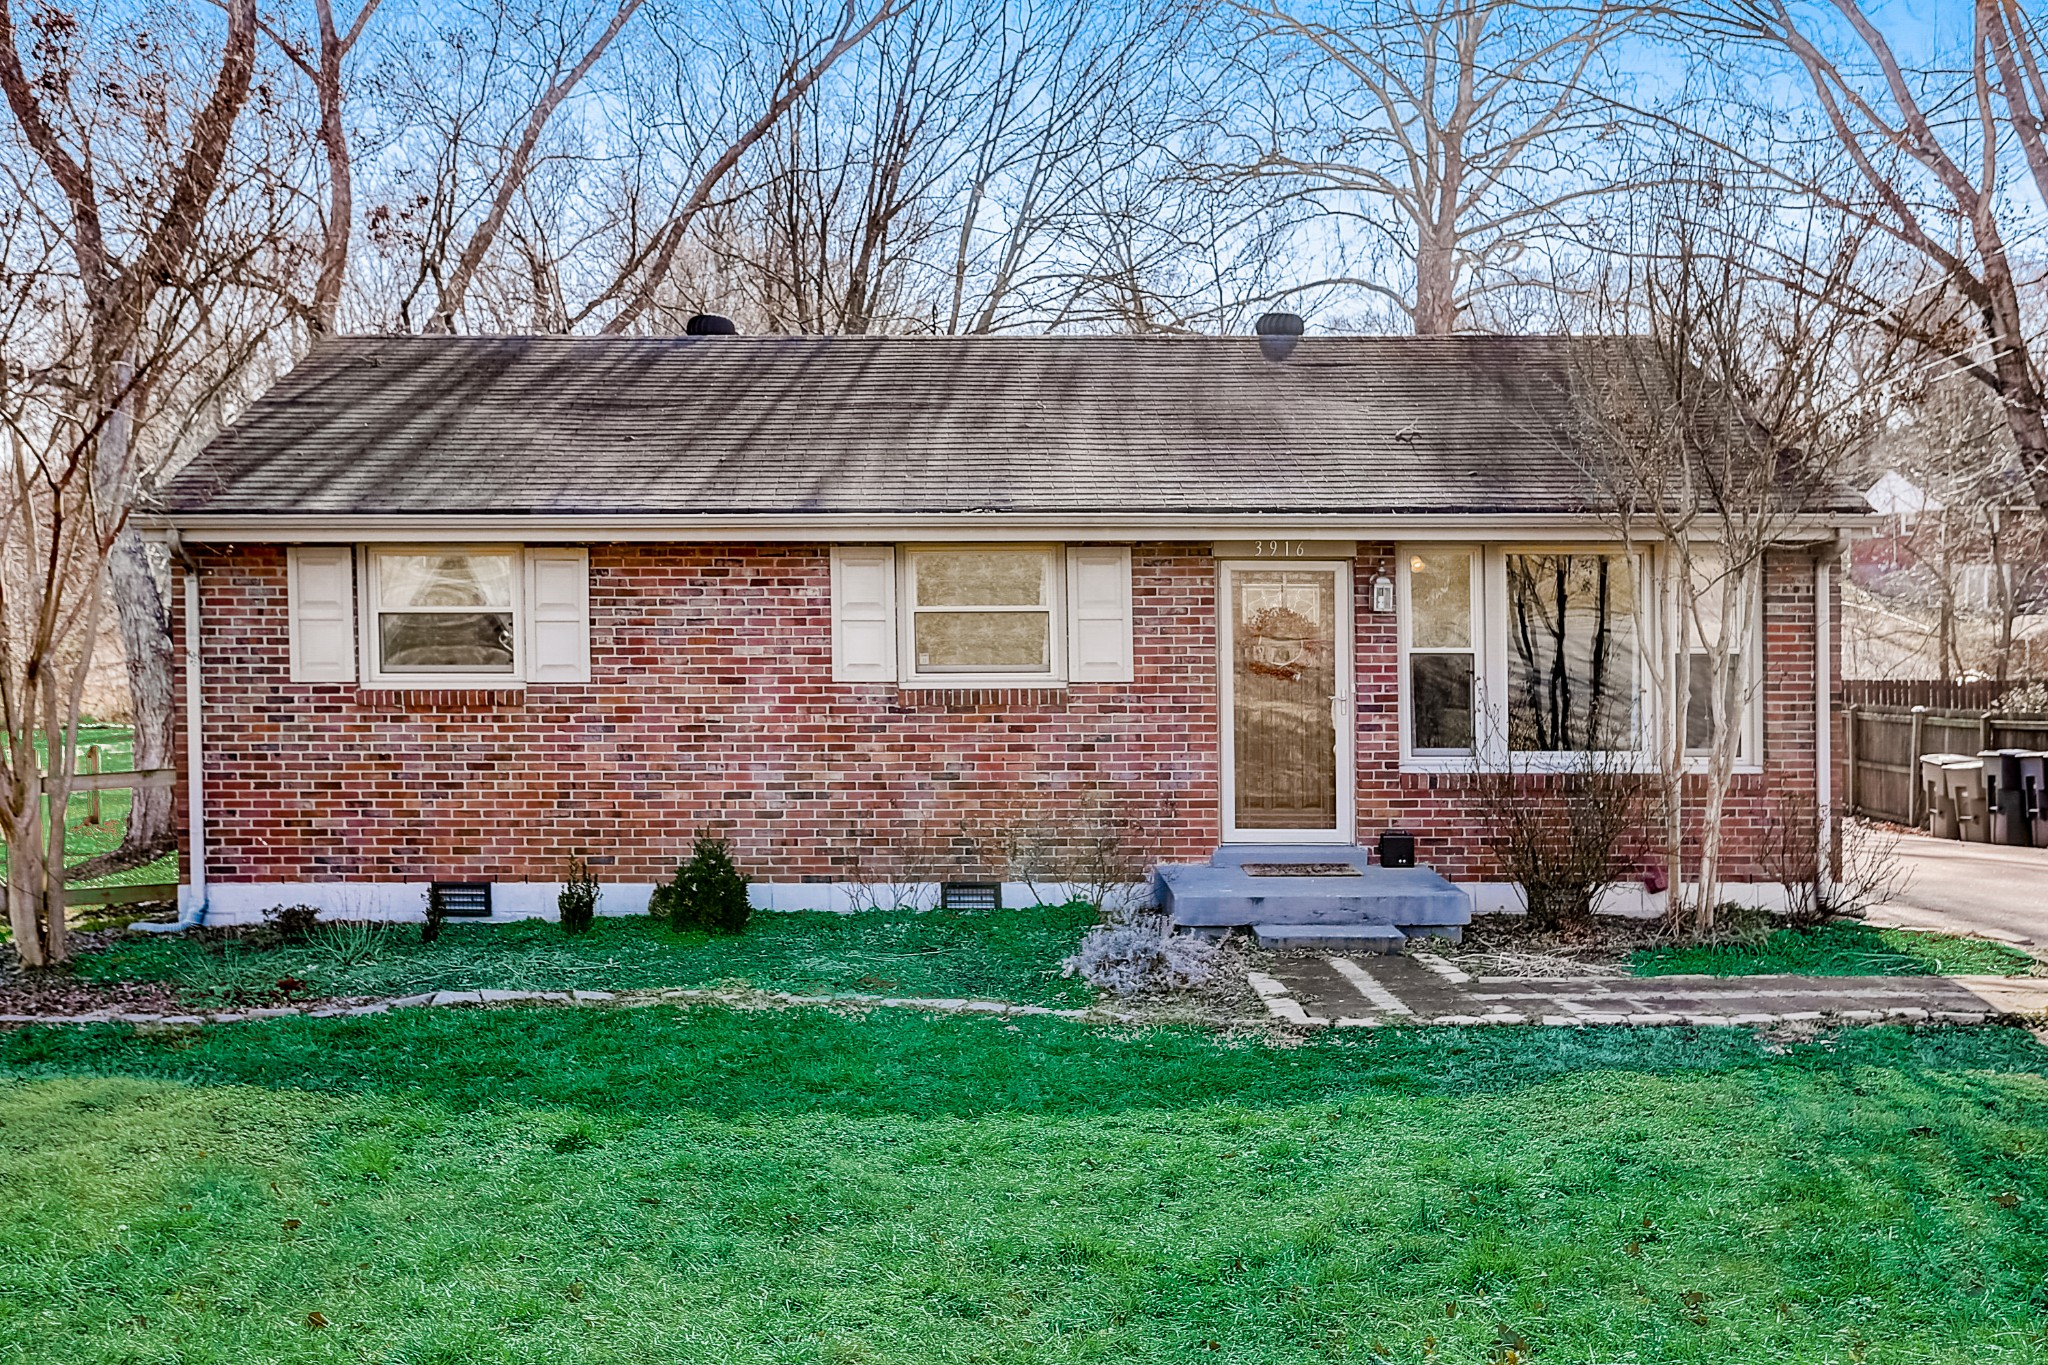 3916 W Valley Dr Property Photo - Nashville, TN real estate listing